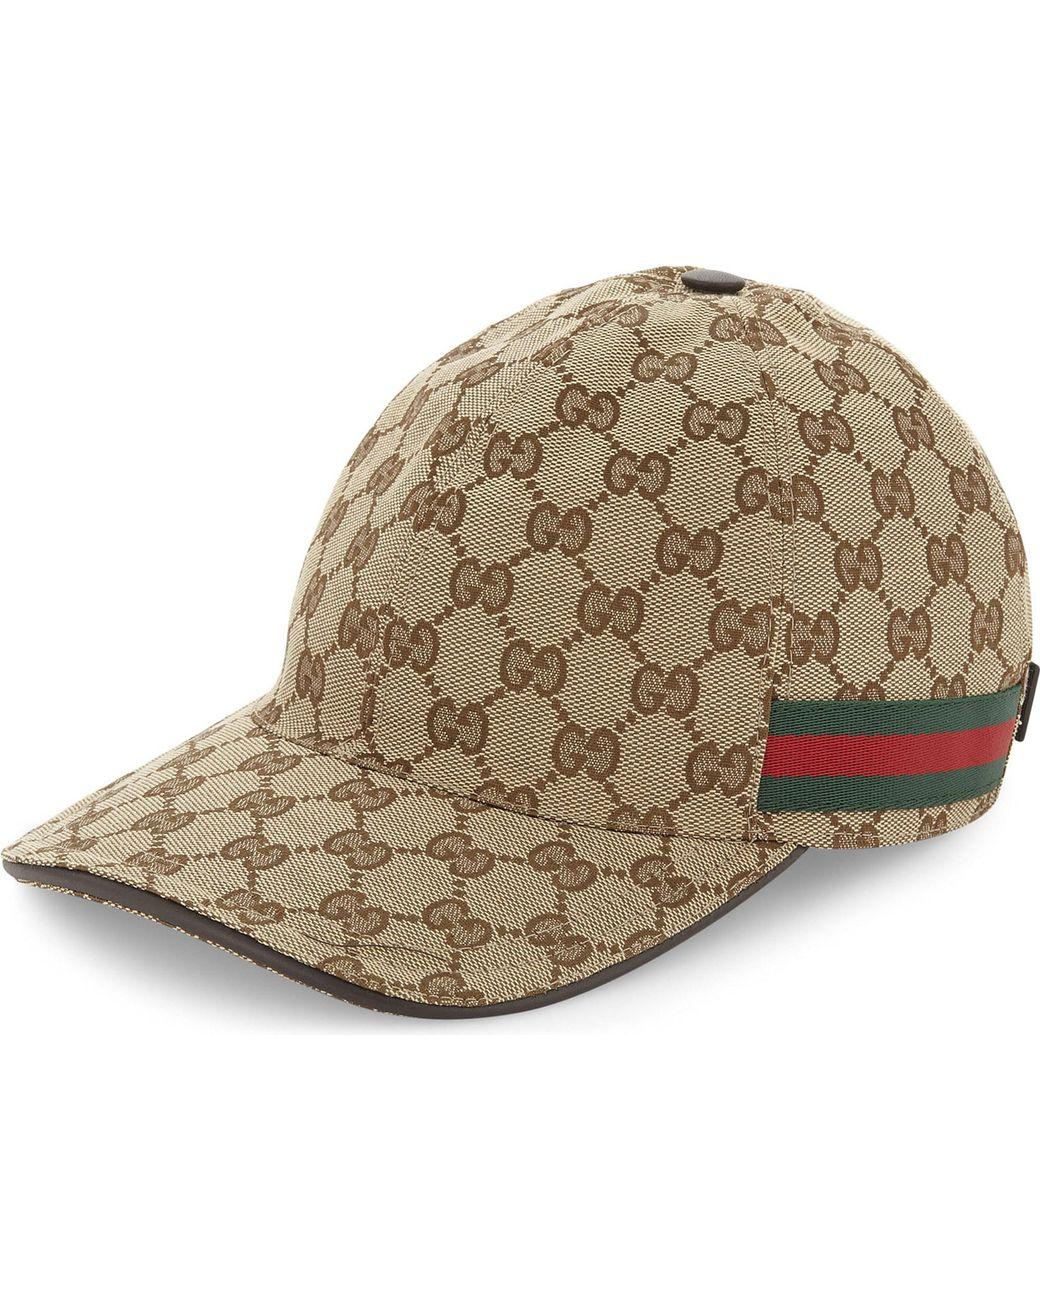 237a44b78fd Gucci Men s Original GG Baseball Hat in Brown for Men - Save 13% - Lyst